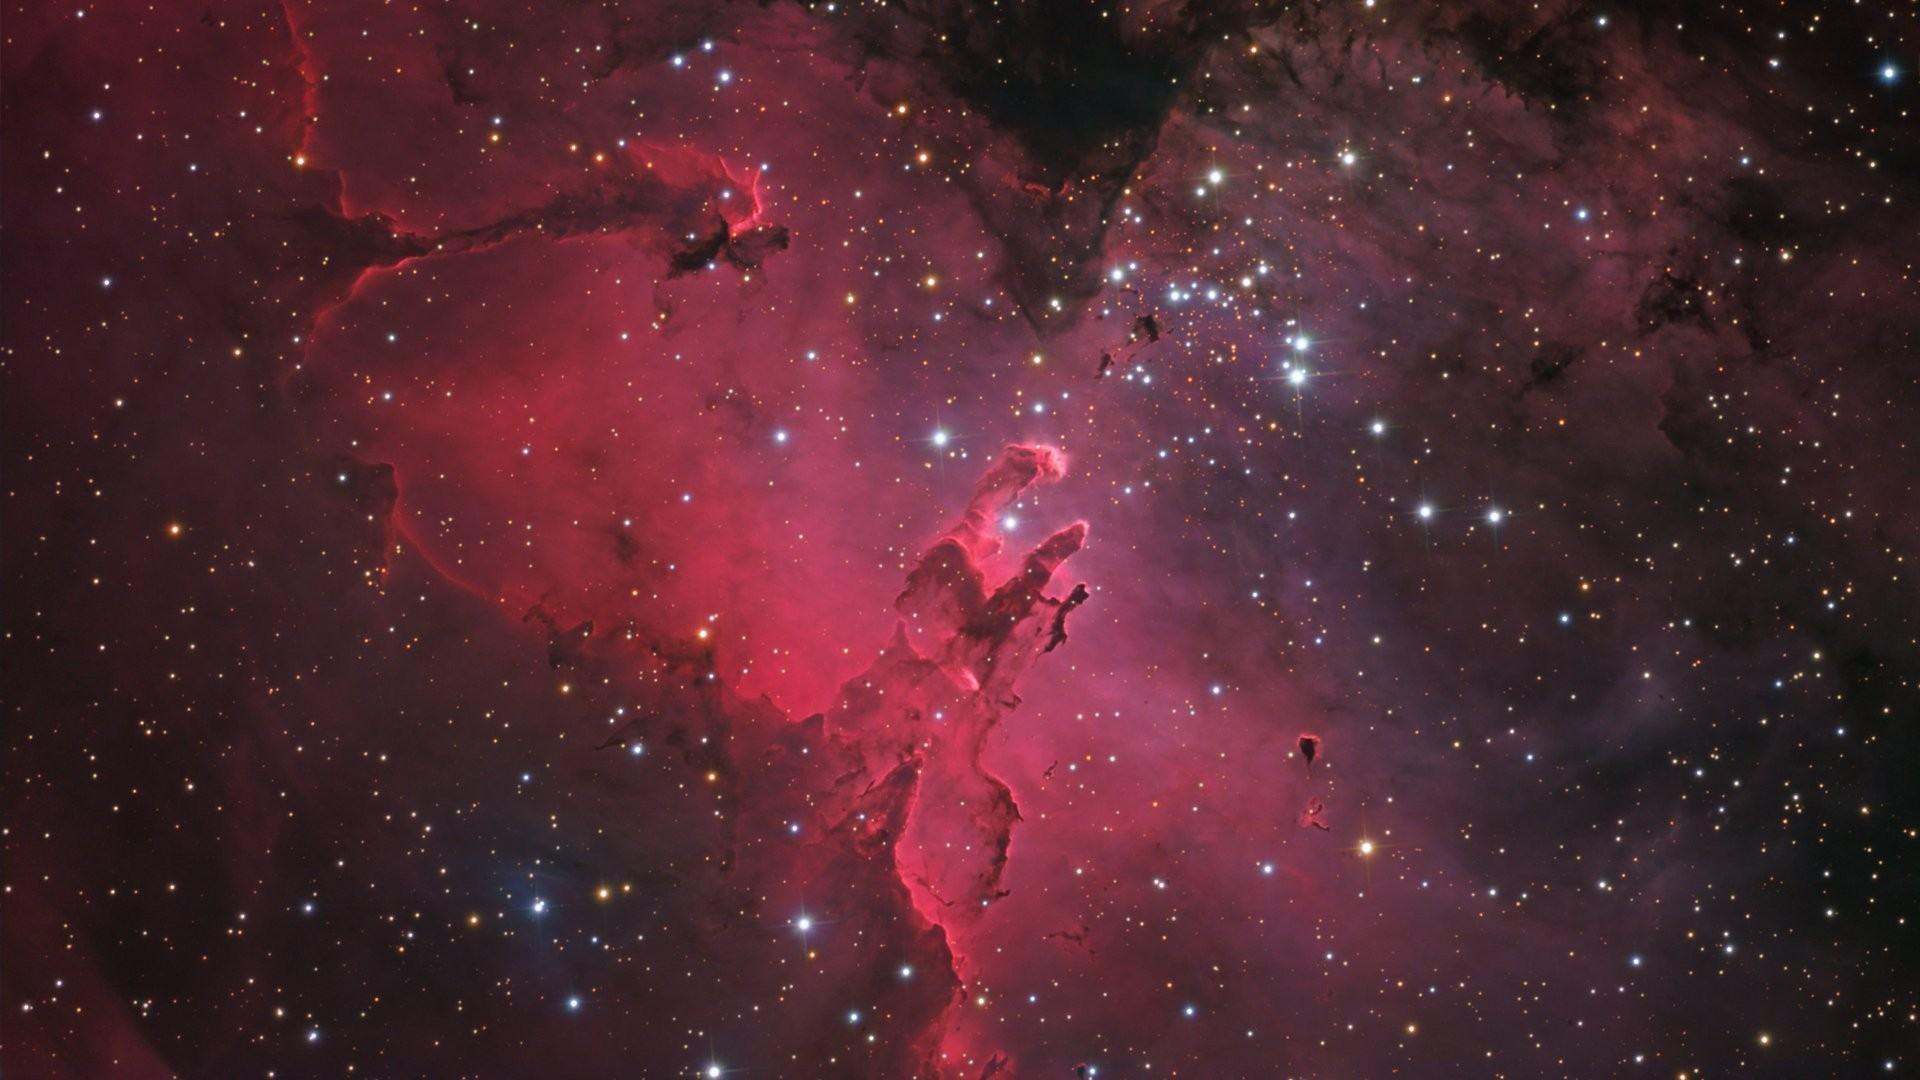 Hubble Telescope Wallpaper Desktop - WallpaperSafari